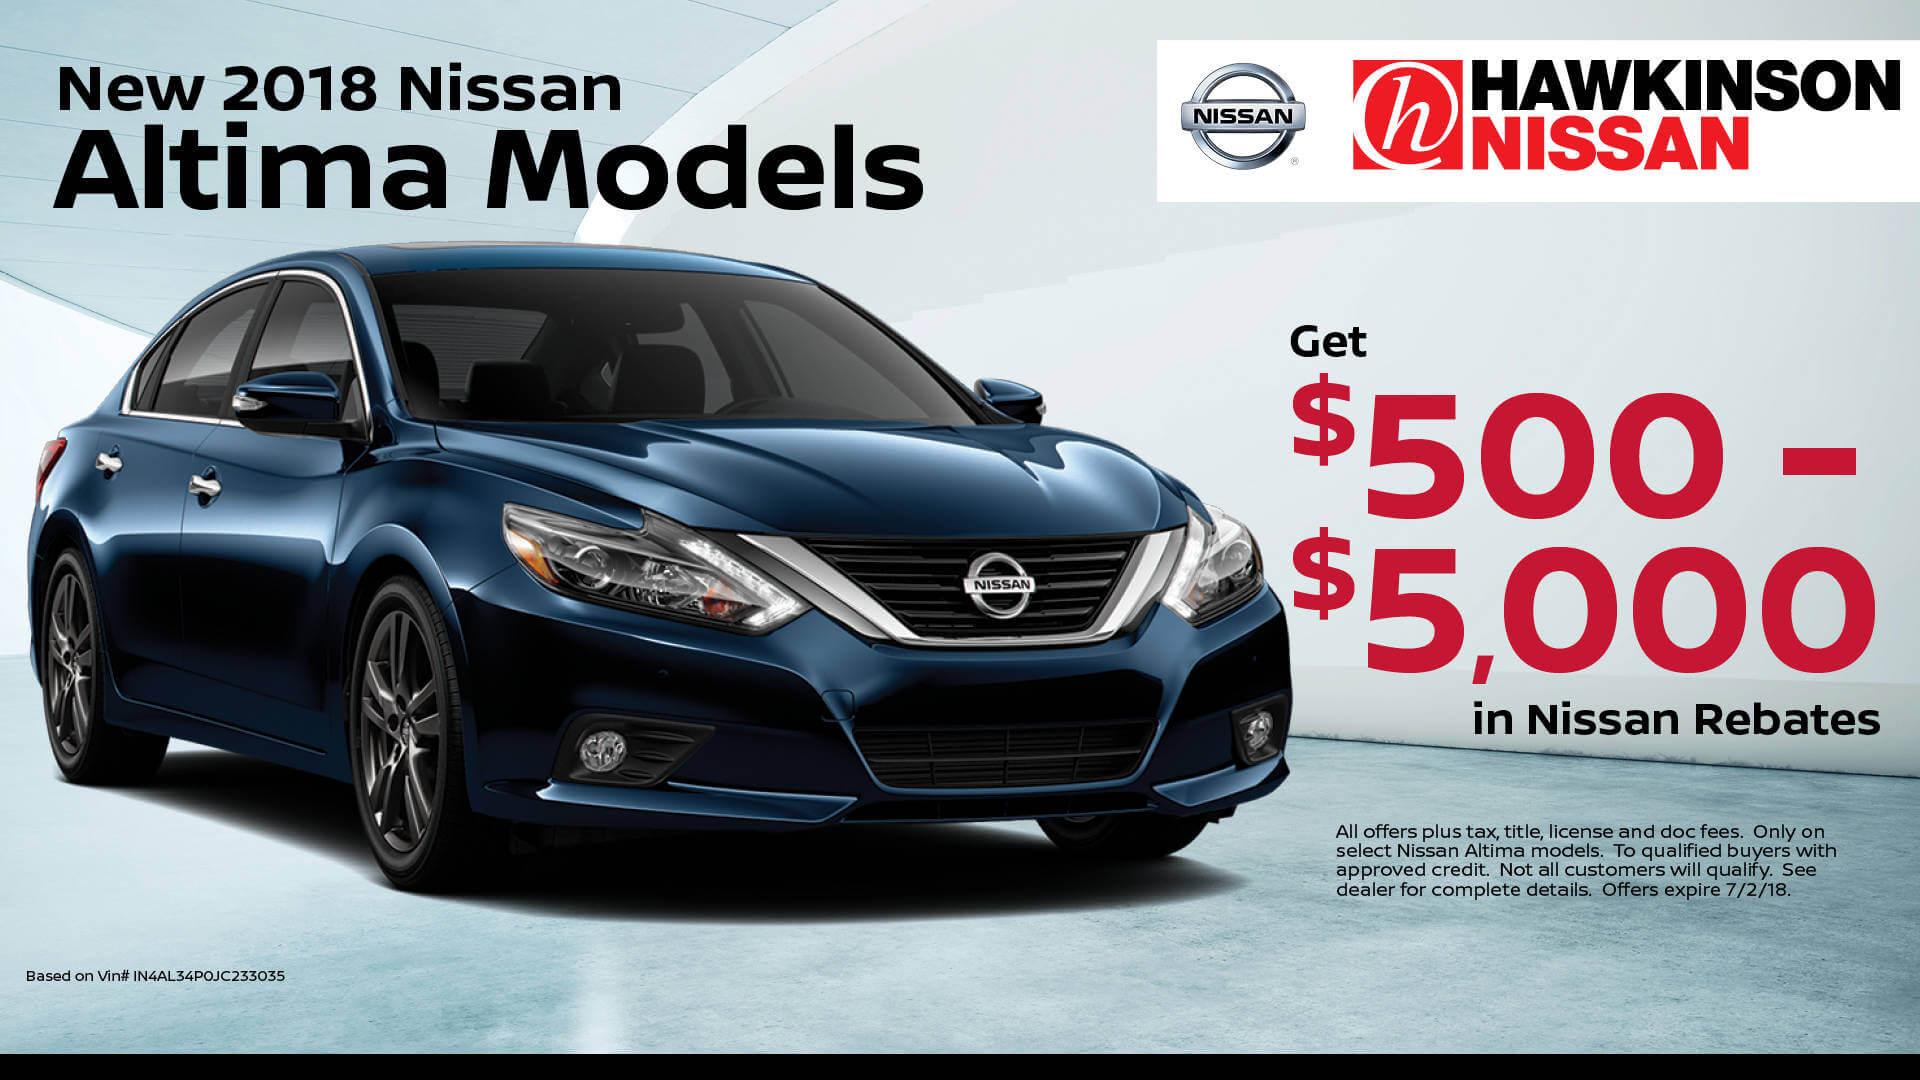 2018 Nissan Altima Models